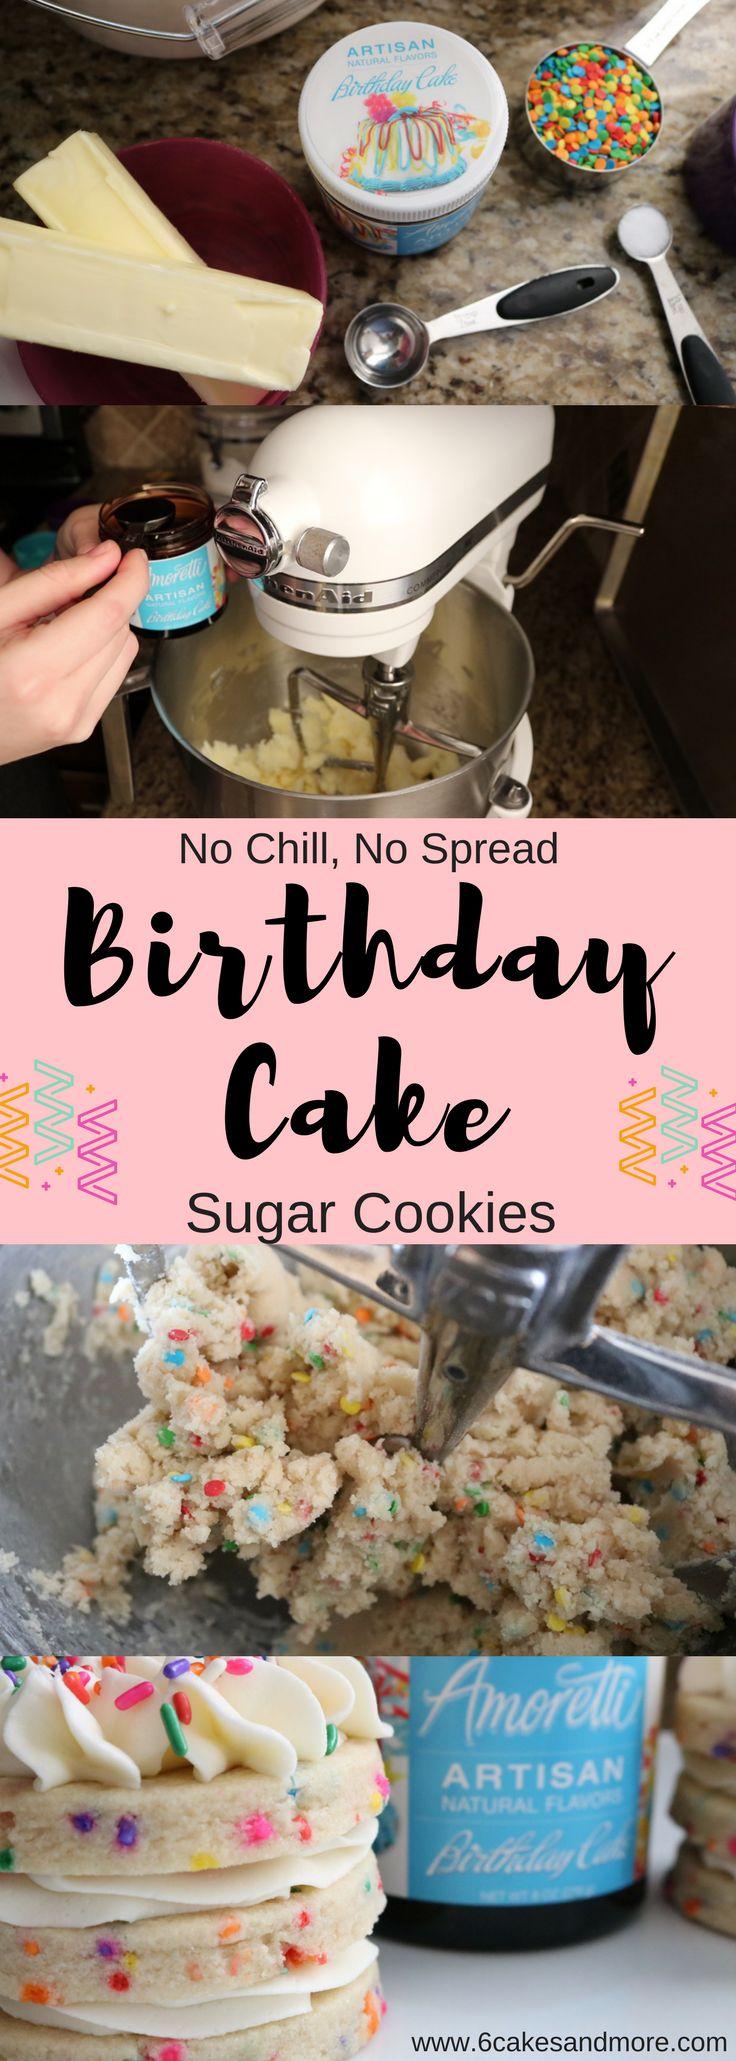 Birthday Cake Sugar Cookies using Amoretti Birthday Cake Artisan Flavor!